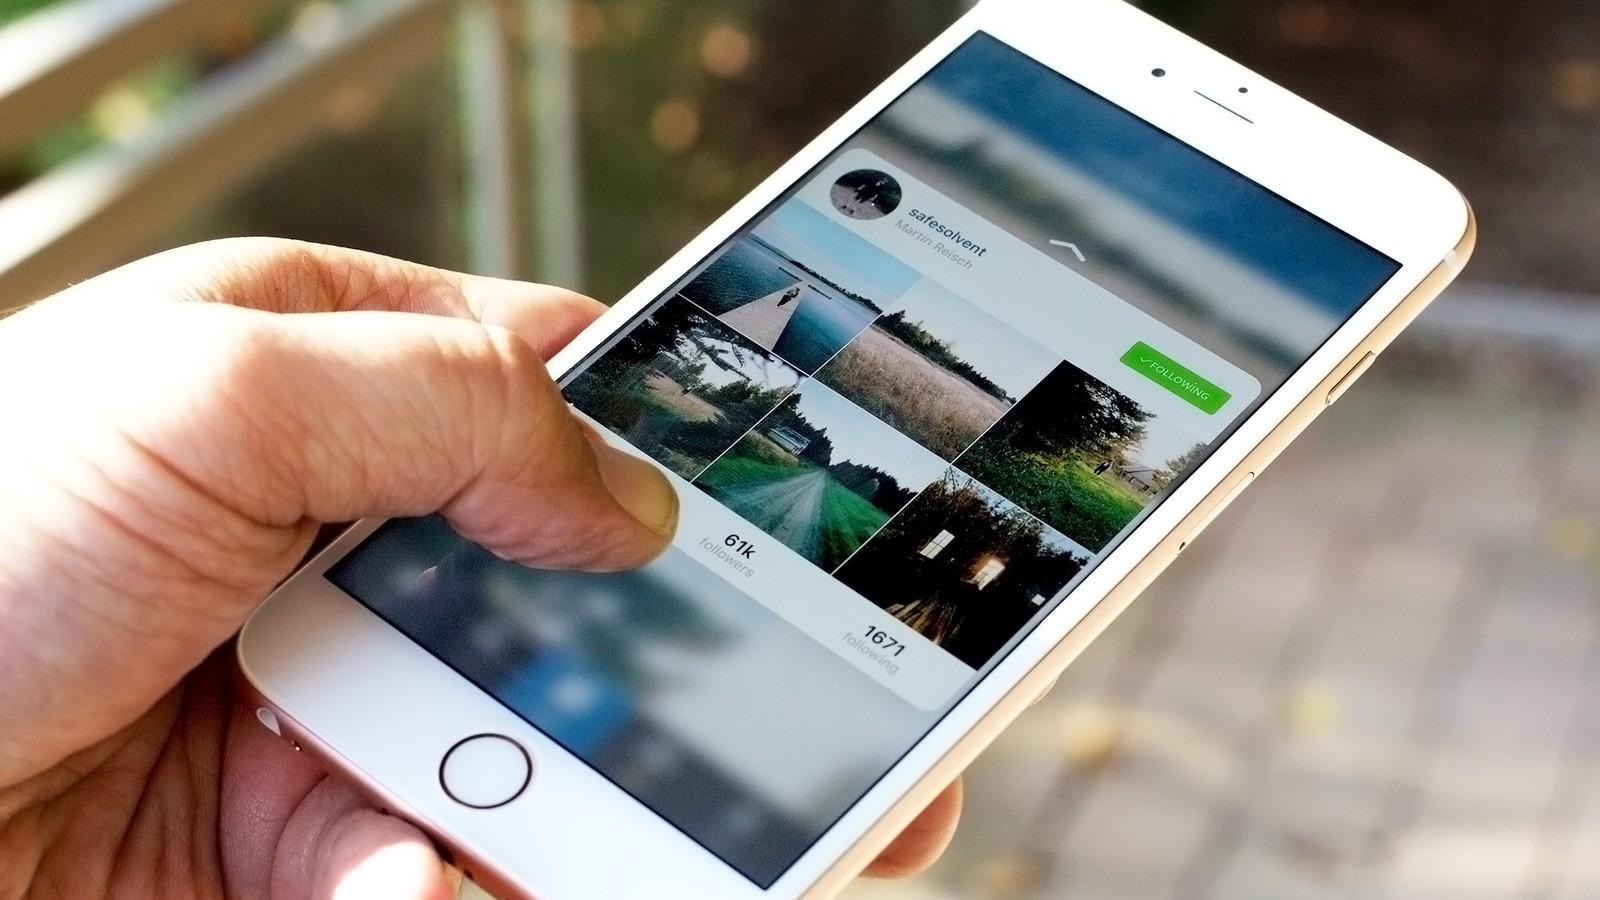 iphone-6s-plus-3d-touch-instagram-hero2